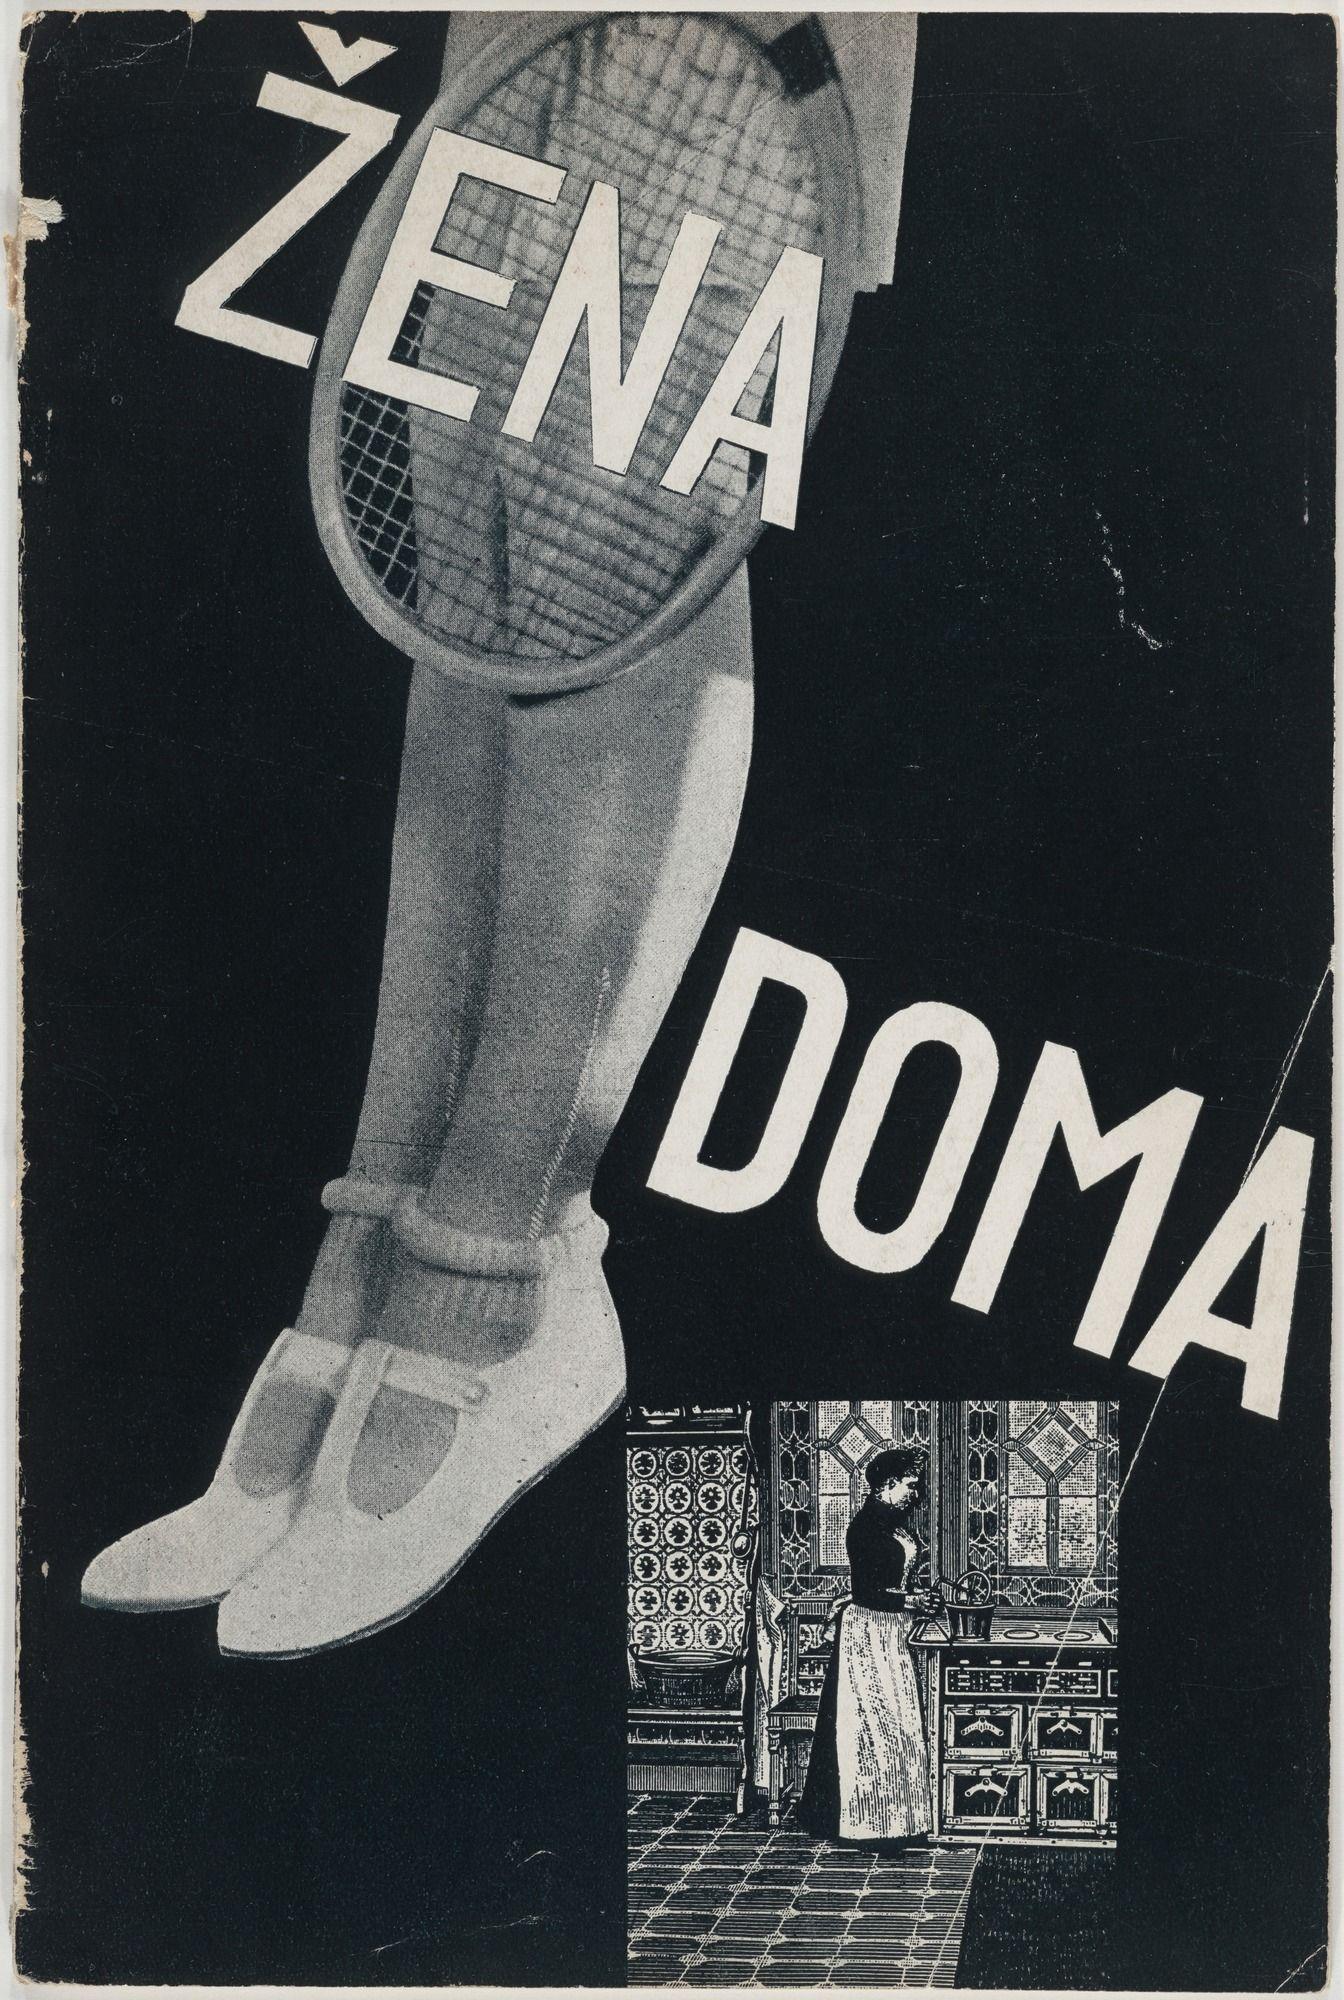 Zdenek Rossmann. Zena doma (Woman at Home) (Catalogue for